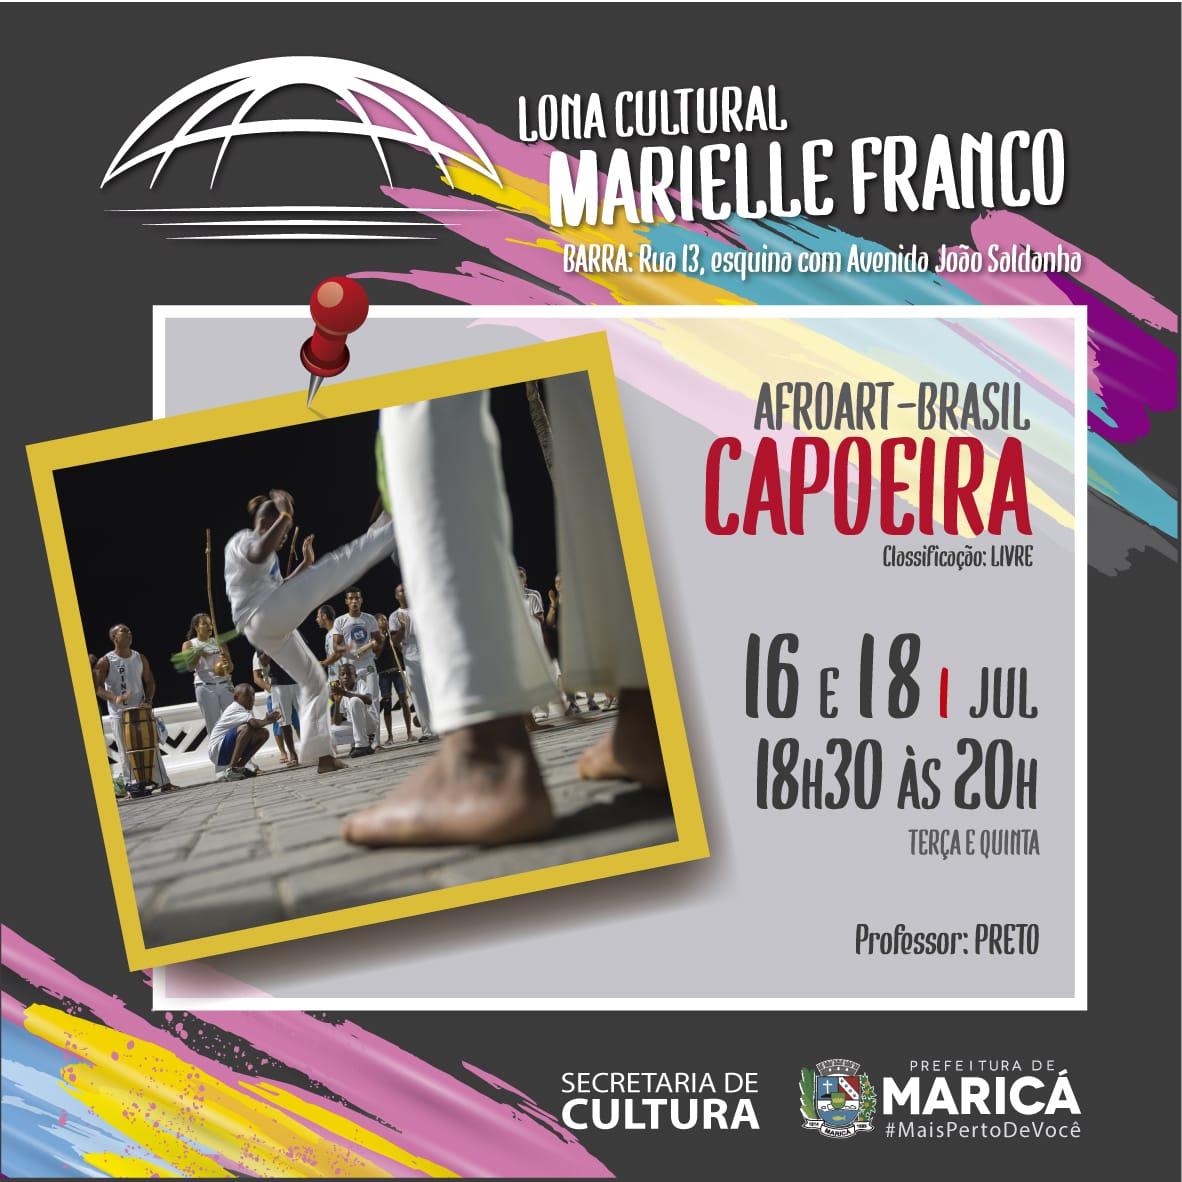 Lona Cultural Barra de Maricá